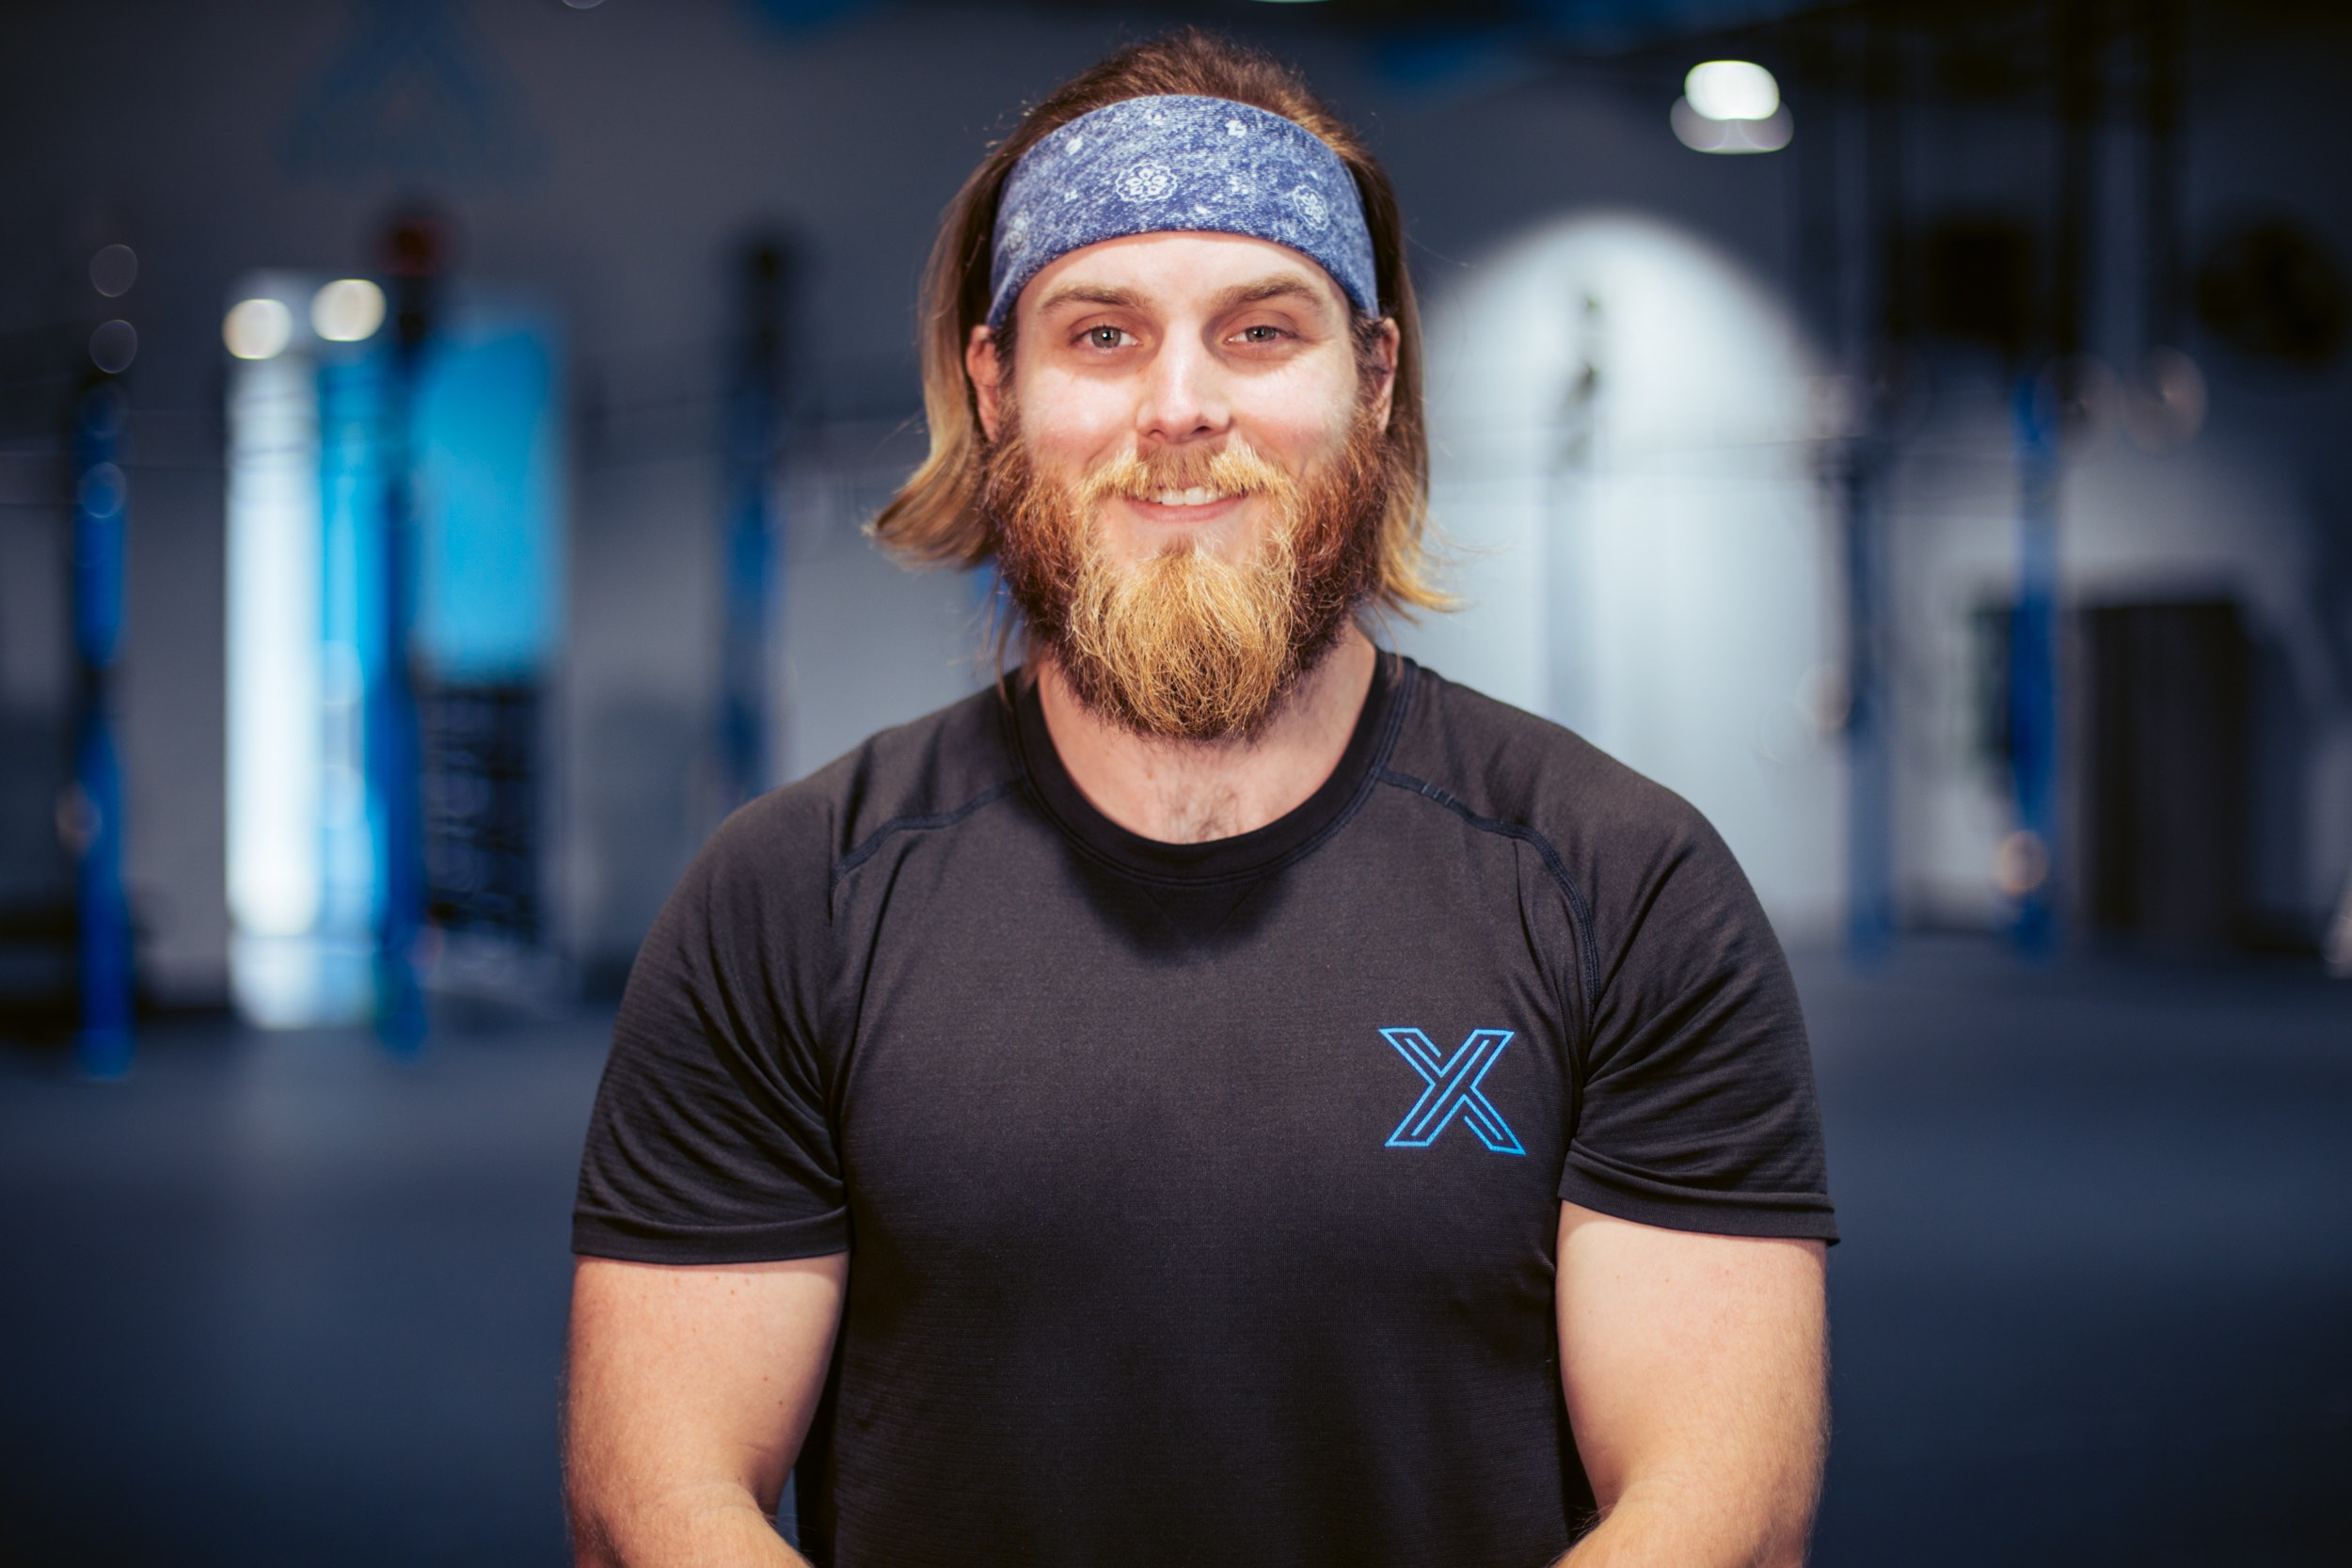 CrossFit, Coach, Fitness, Gym, Birmingham